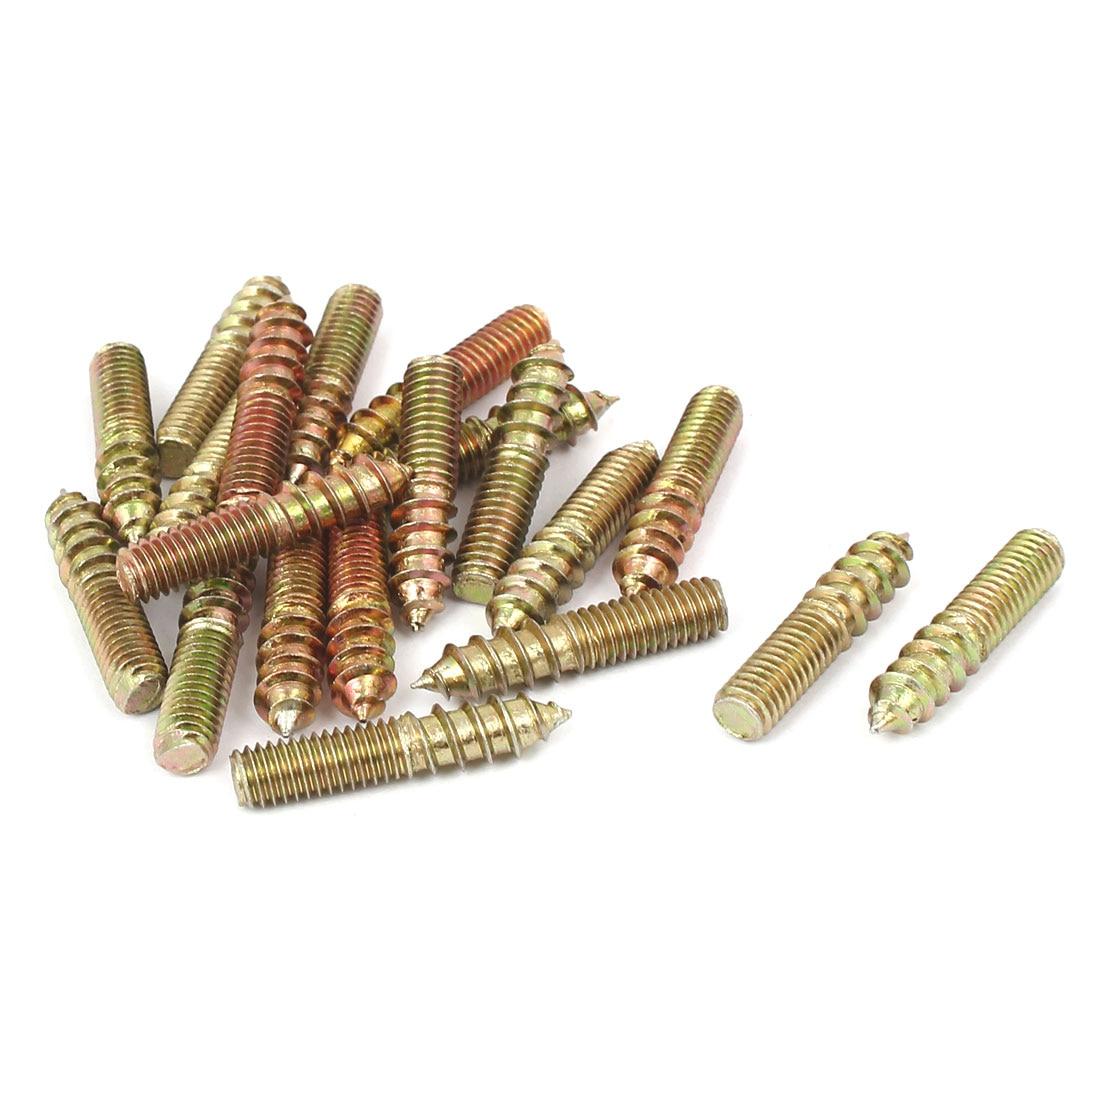 uxcell 20 Pcs 15//64 Inch X 15//32 Inch Flat Head Copper Tone Solid Rivets Fasteners